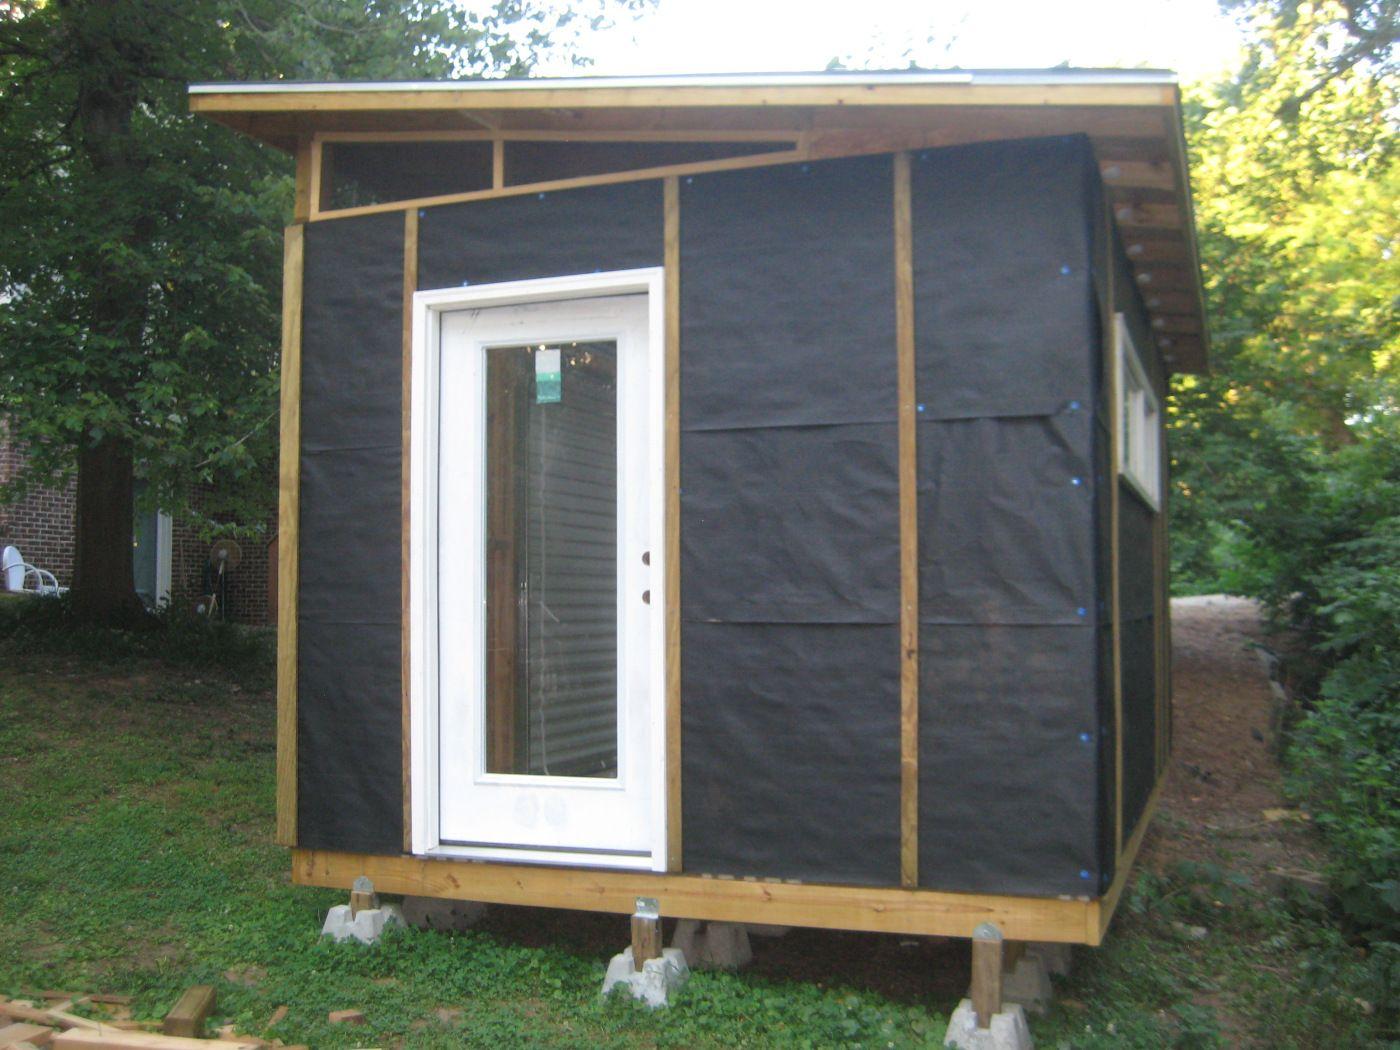 Diy Modern Shed Project Cabane Jardin Cabanon De Jardin Abri Bois